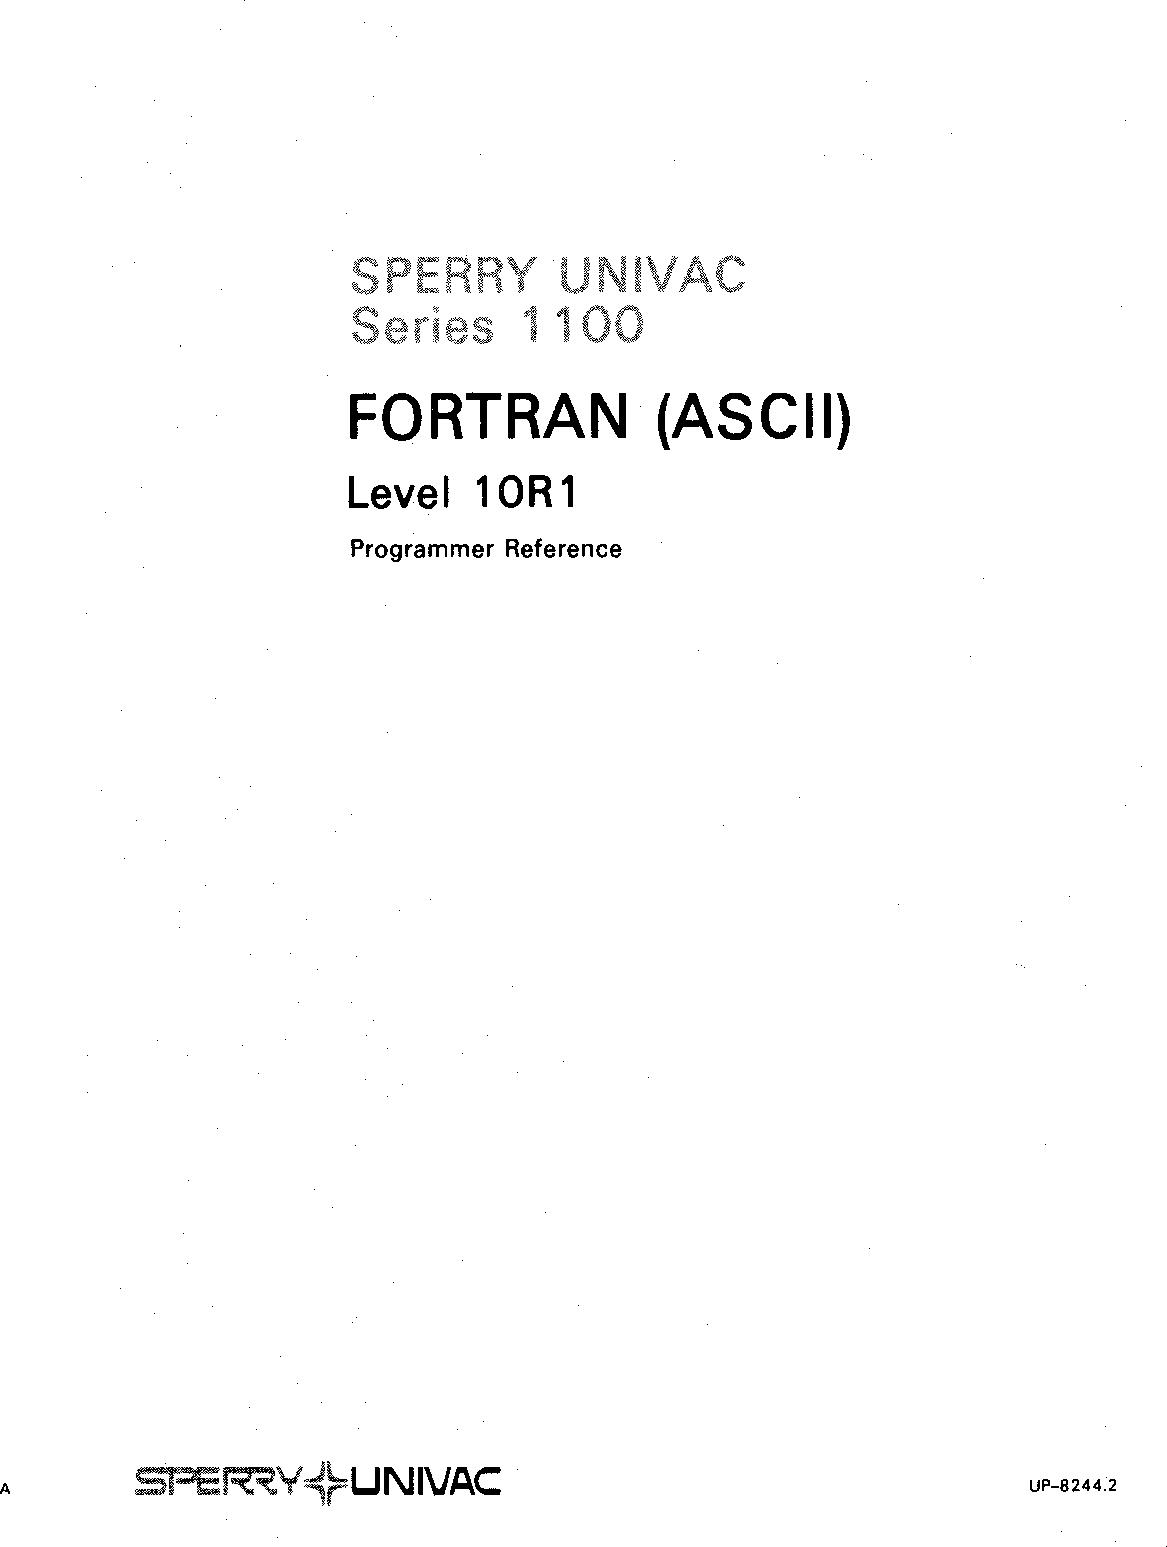 UP 8244 2_1100_ASCII_Fortran_10R1_1982 8244 2 1100 ASCII Fortran